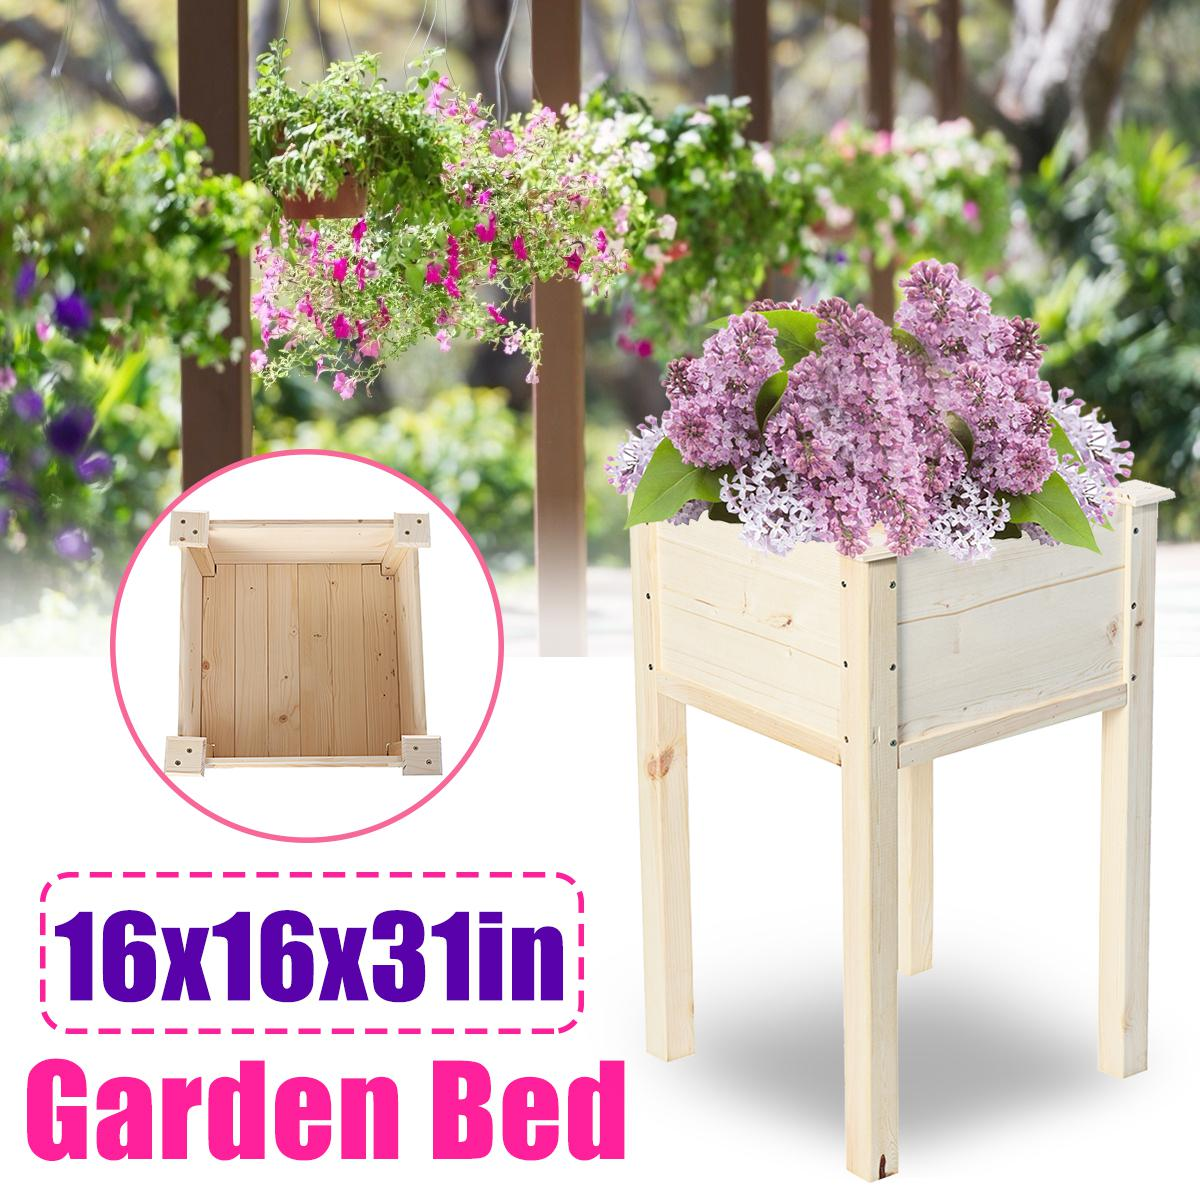 41x41x79cm Original Cedar Elevated Garden Vegetable Bed Raised For Vegetables Elevated Planter Box With Legs Outdoor Patio Flower Herb Container Gardening Kogan Com